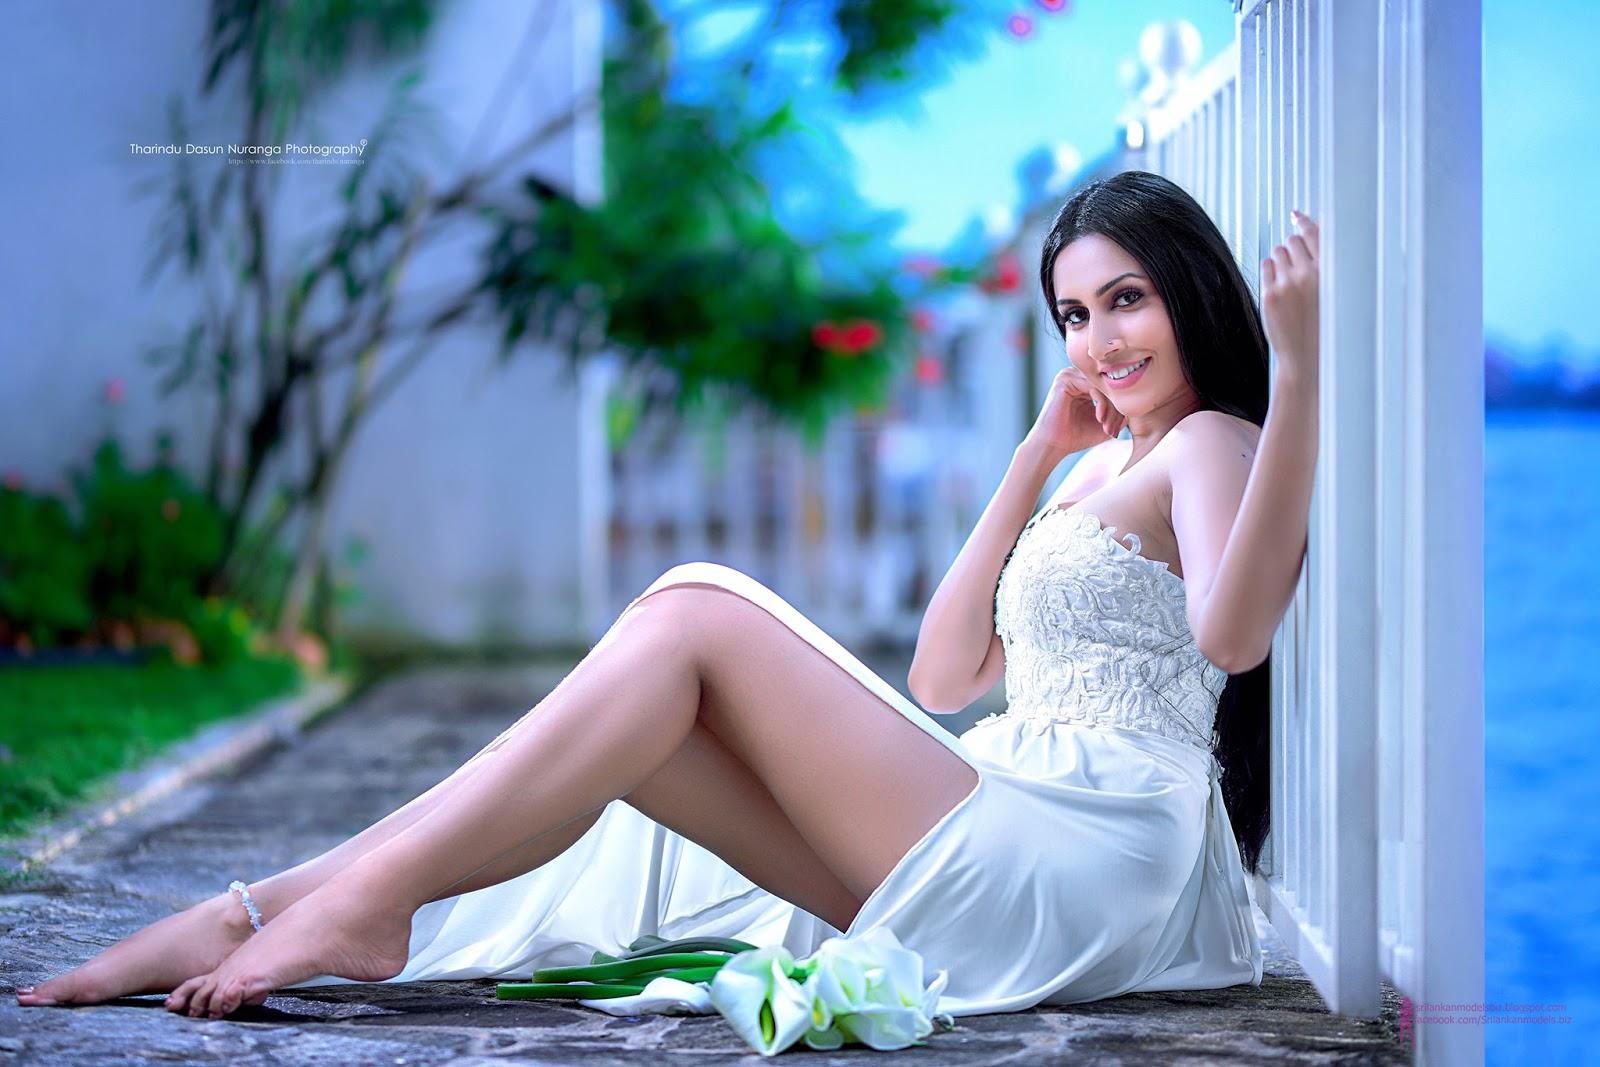 .: Nilukshi Amanda Silvas photo Gallery